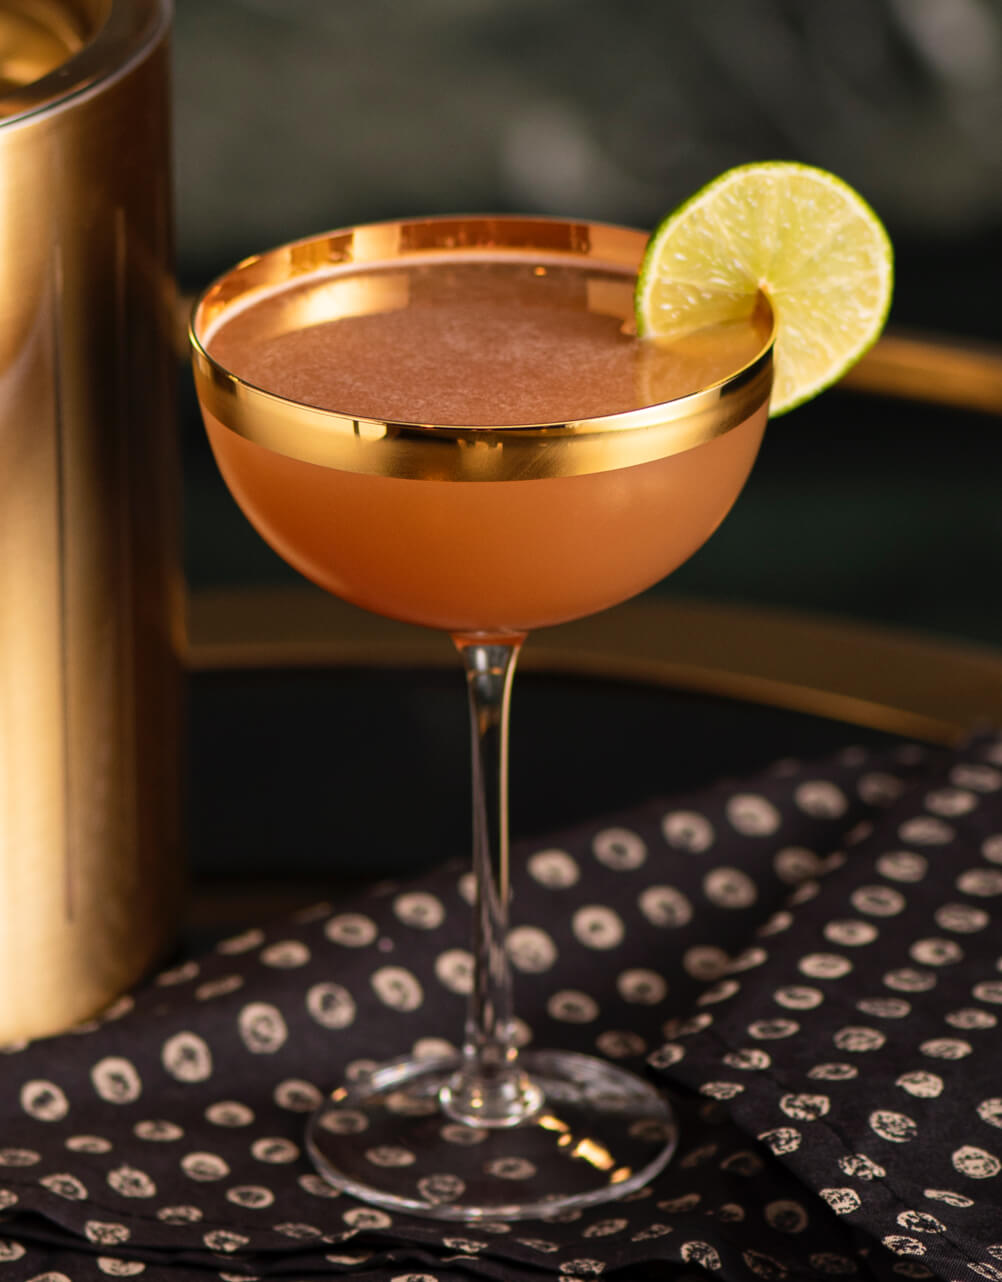 Zaya Black Daiquiri cocktail